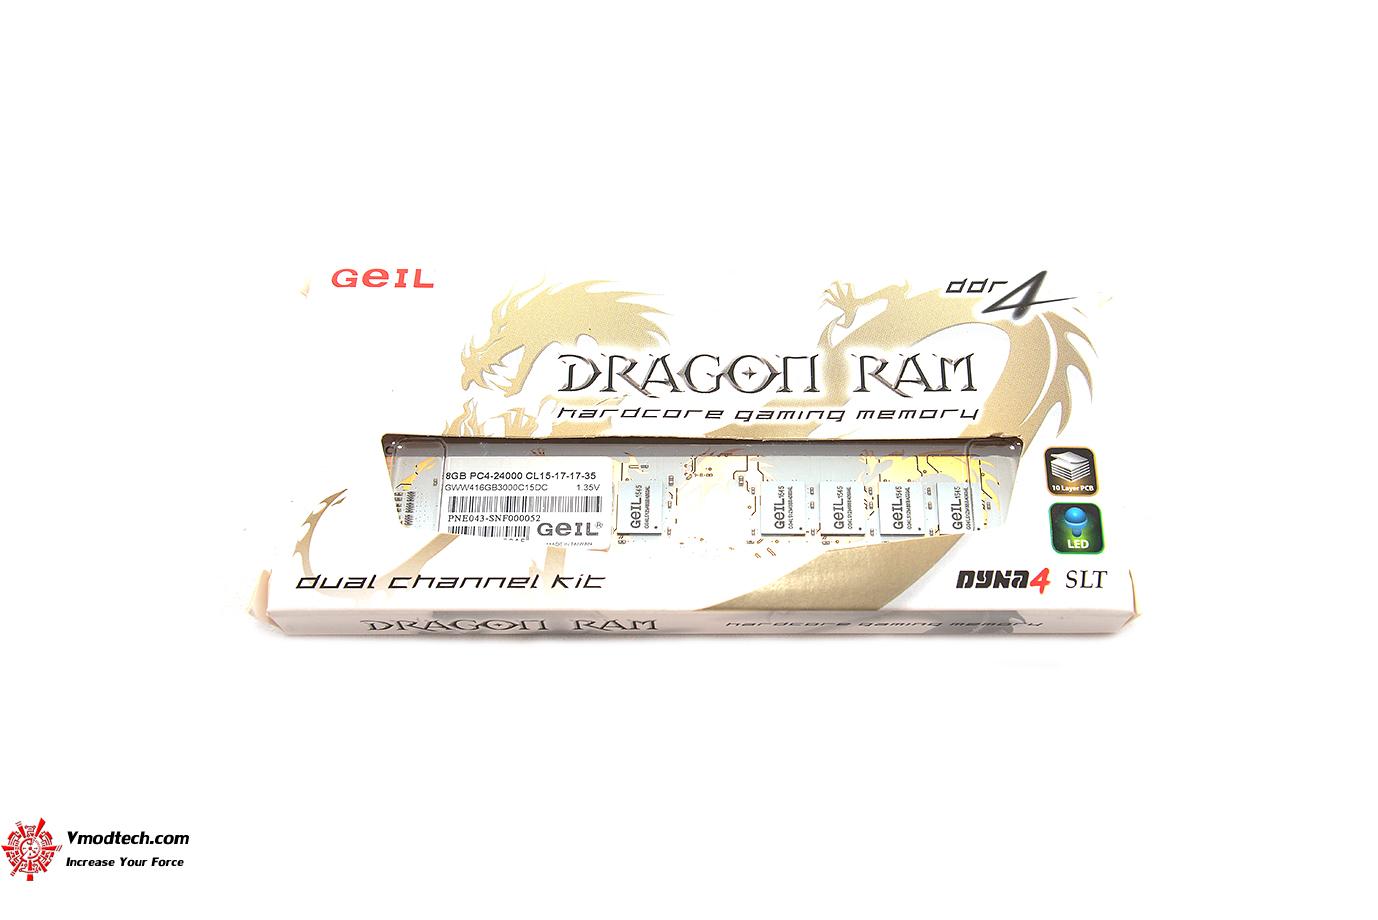 dsc 3598 GEIL DDR4 Dragon RAM 3000Mhz 16GB REVIEW